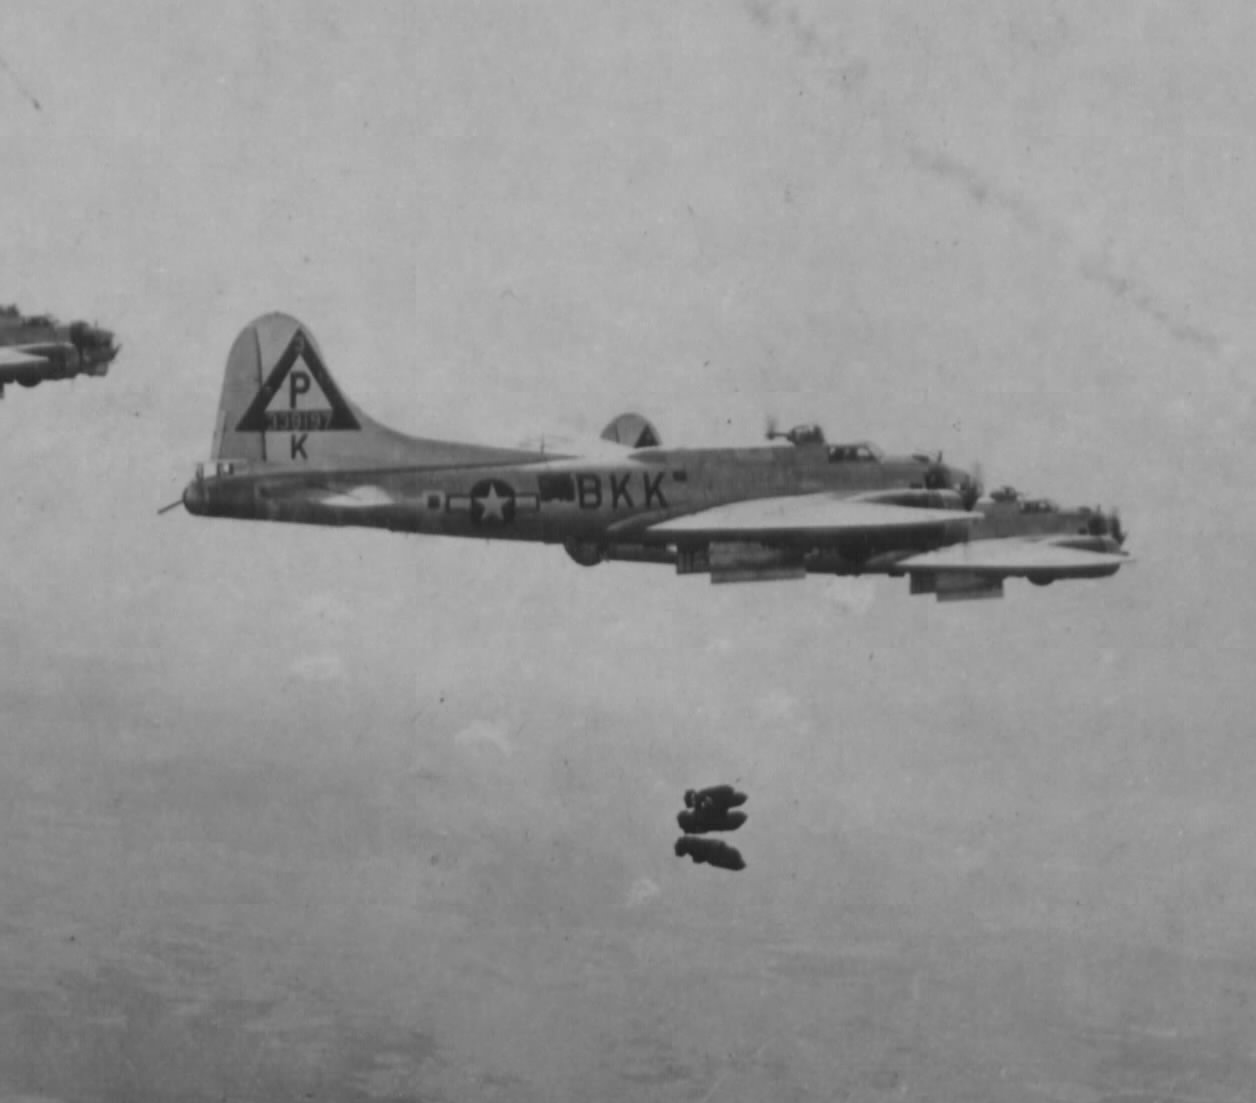 B-17 #43-39197 / Baby Judy aka School Marm